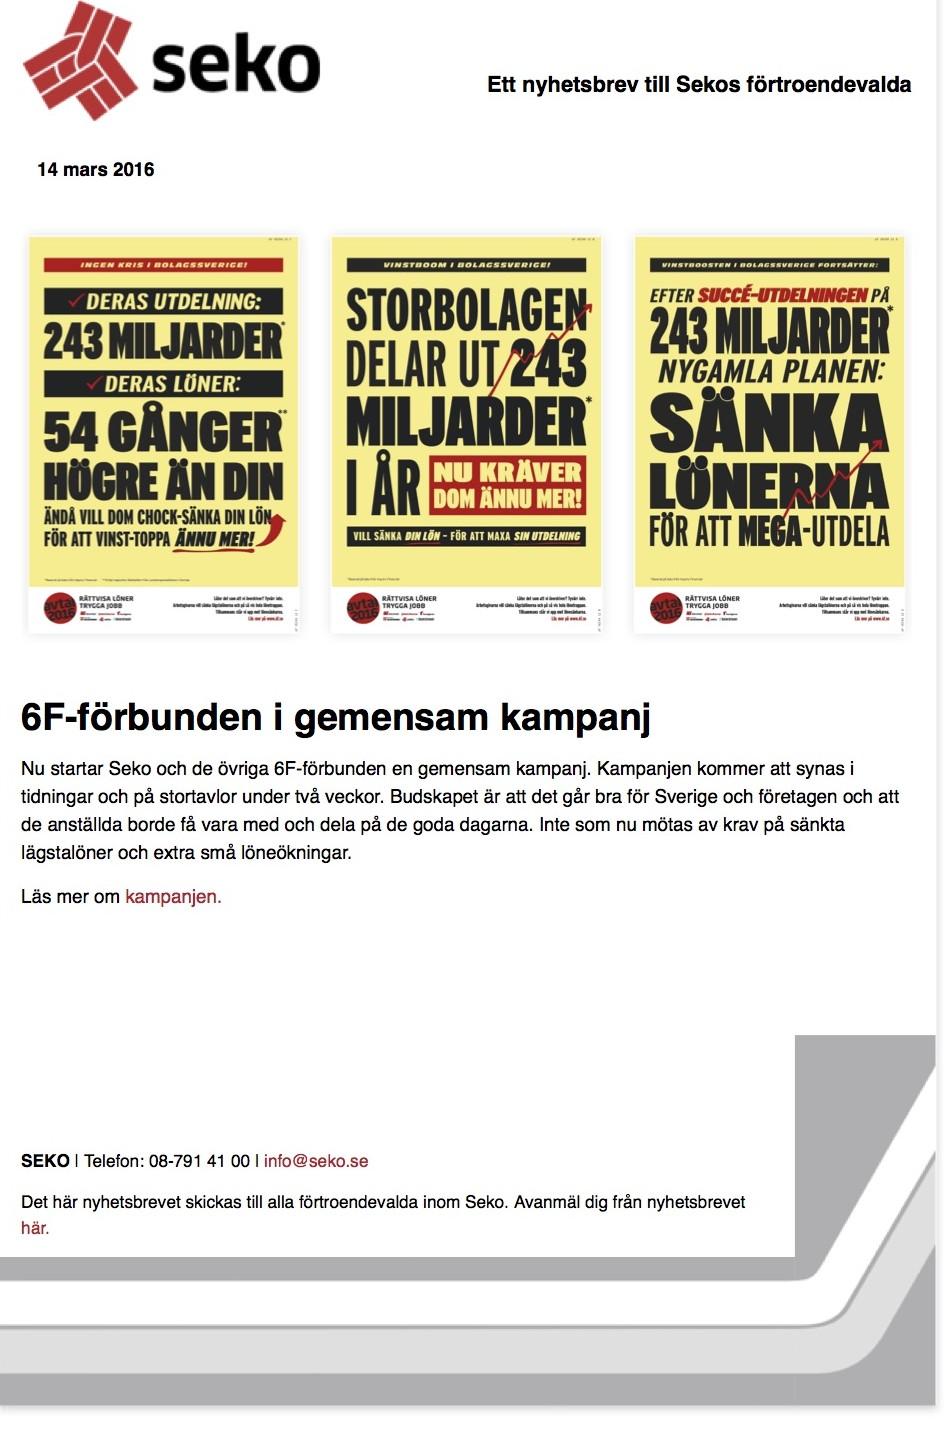 6F-forbunden i gemensam kampanj